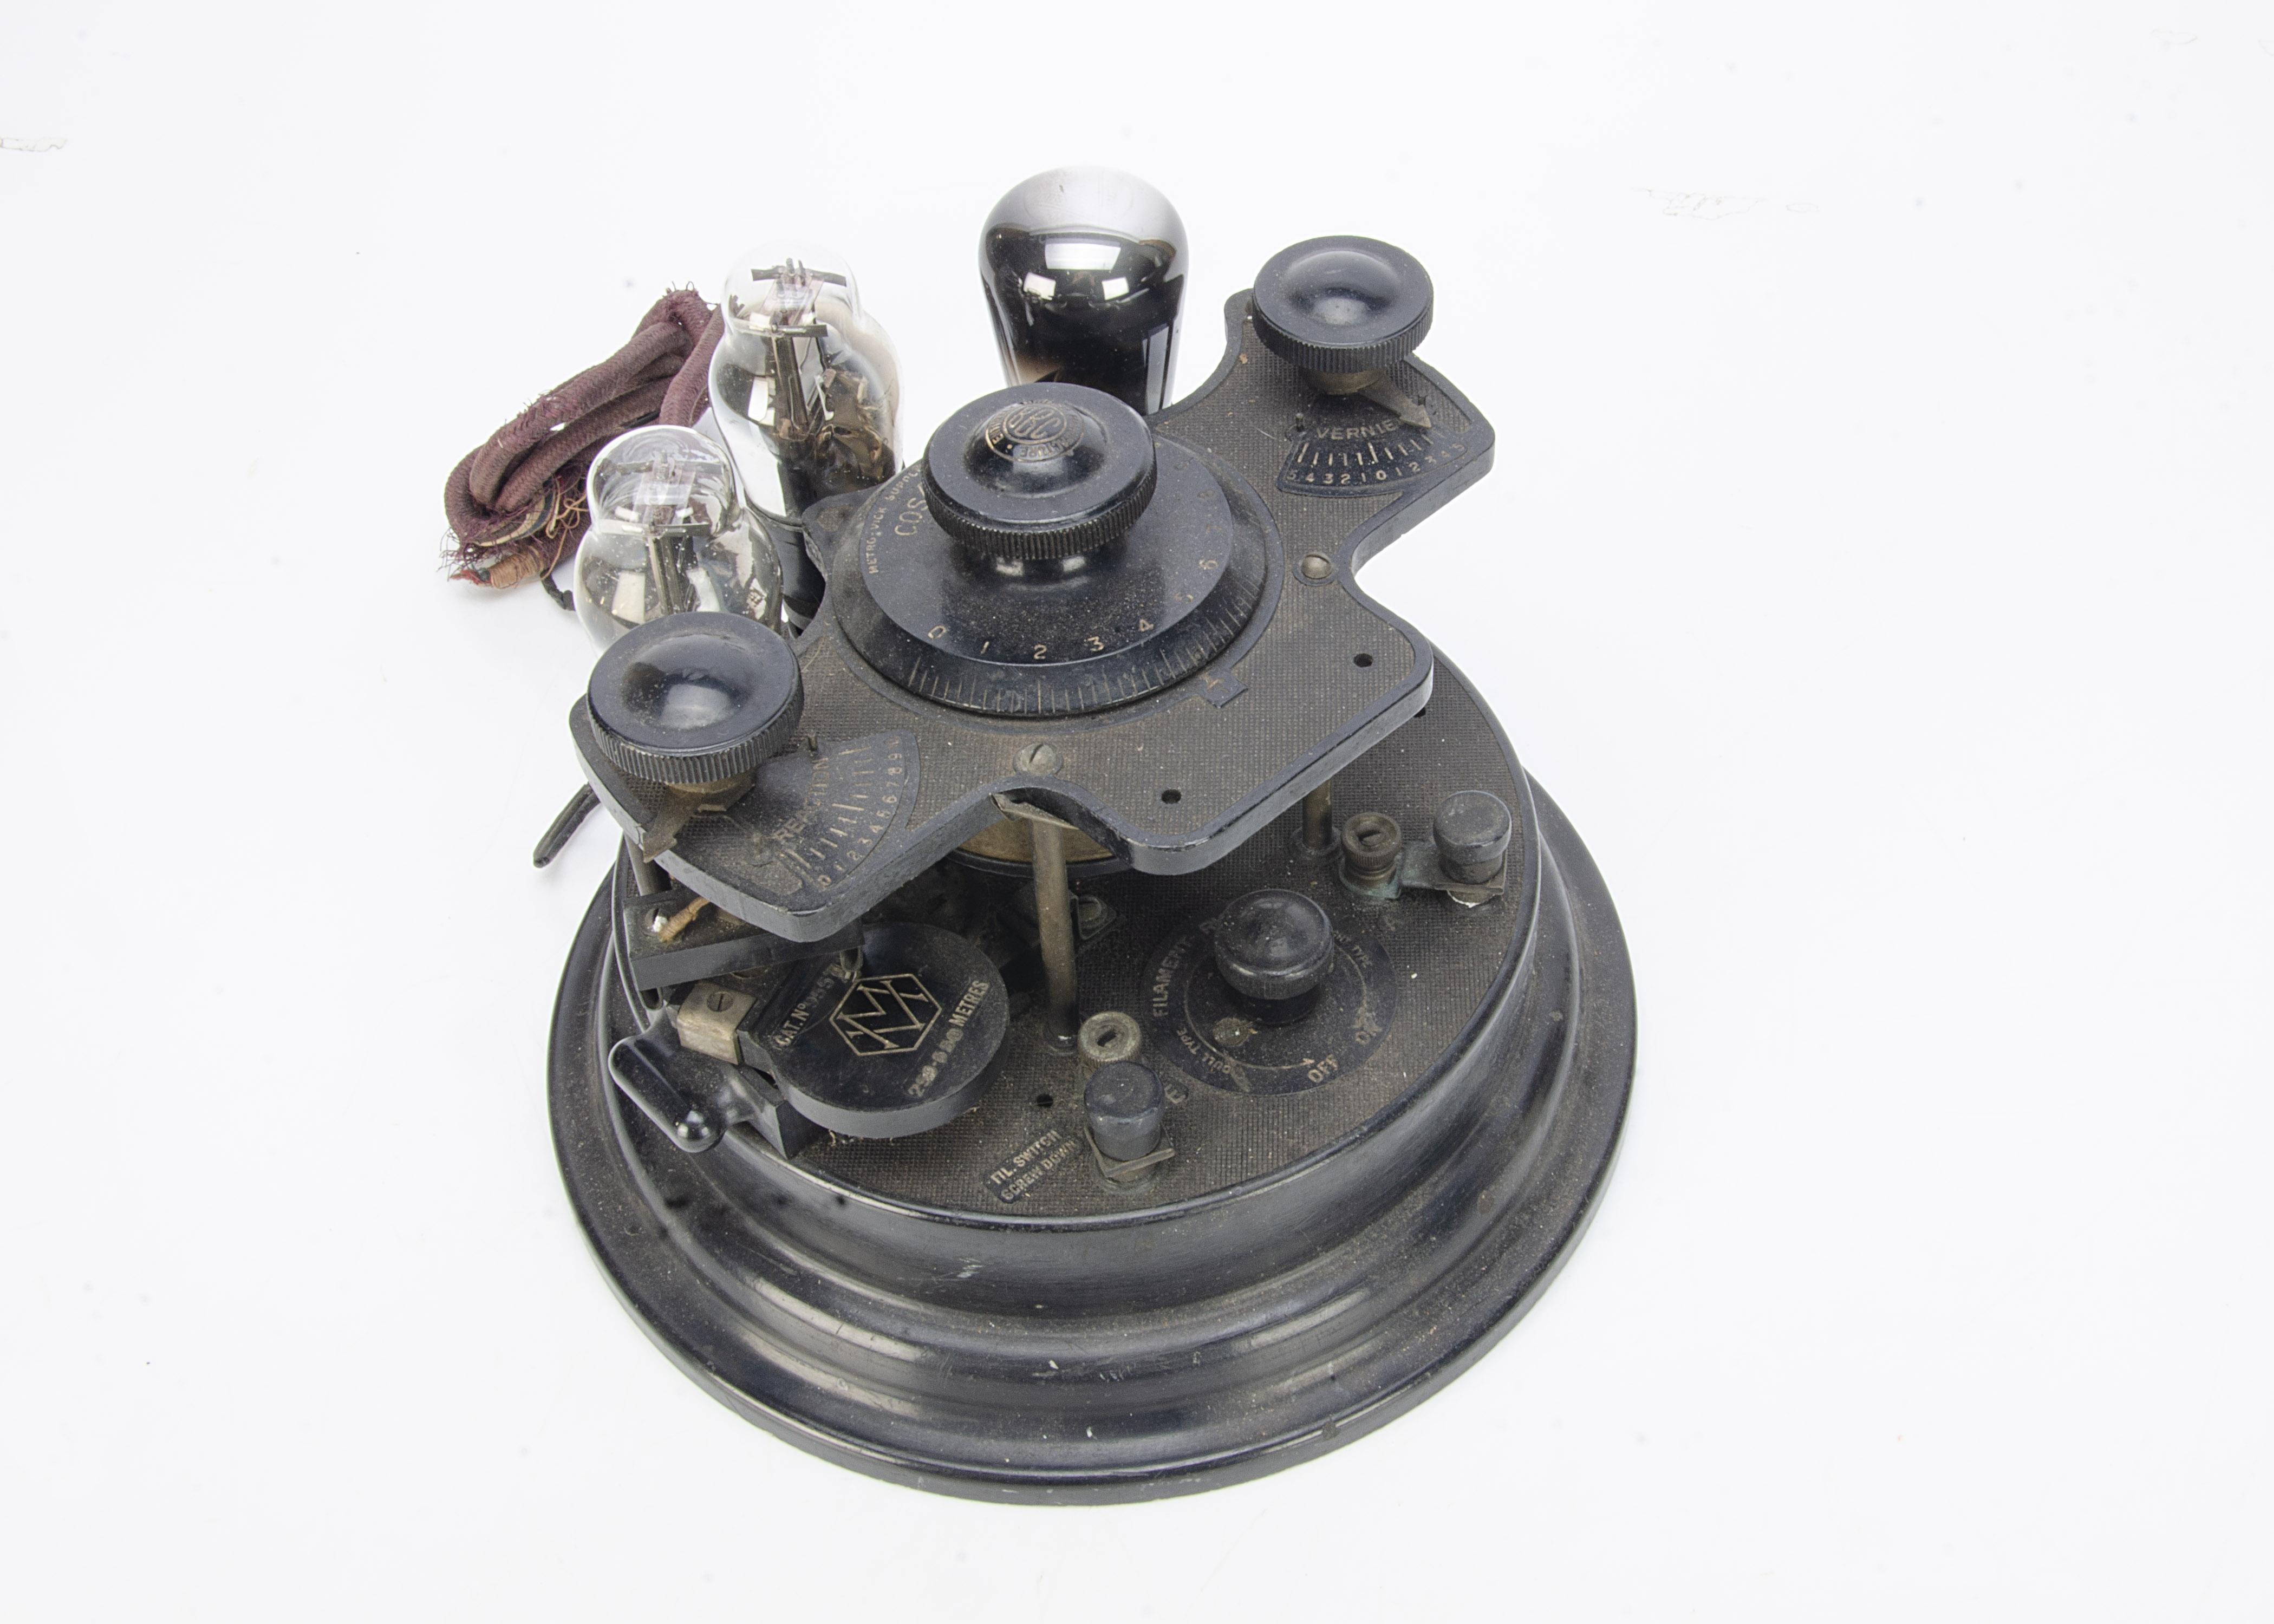 Cosmos Radiophone VR4, a Cosmos Radiophone VR4 'Cruet Set' 3 valve wireless receiver CAT No:89591